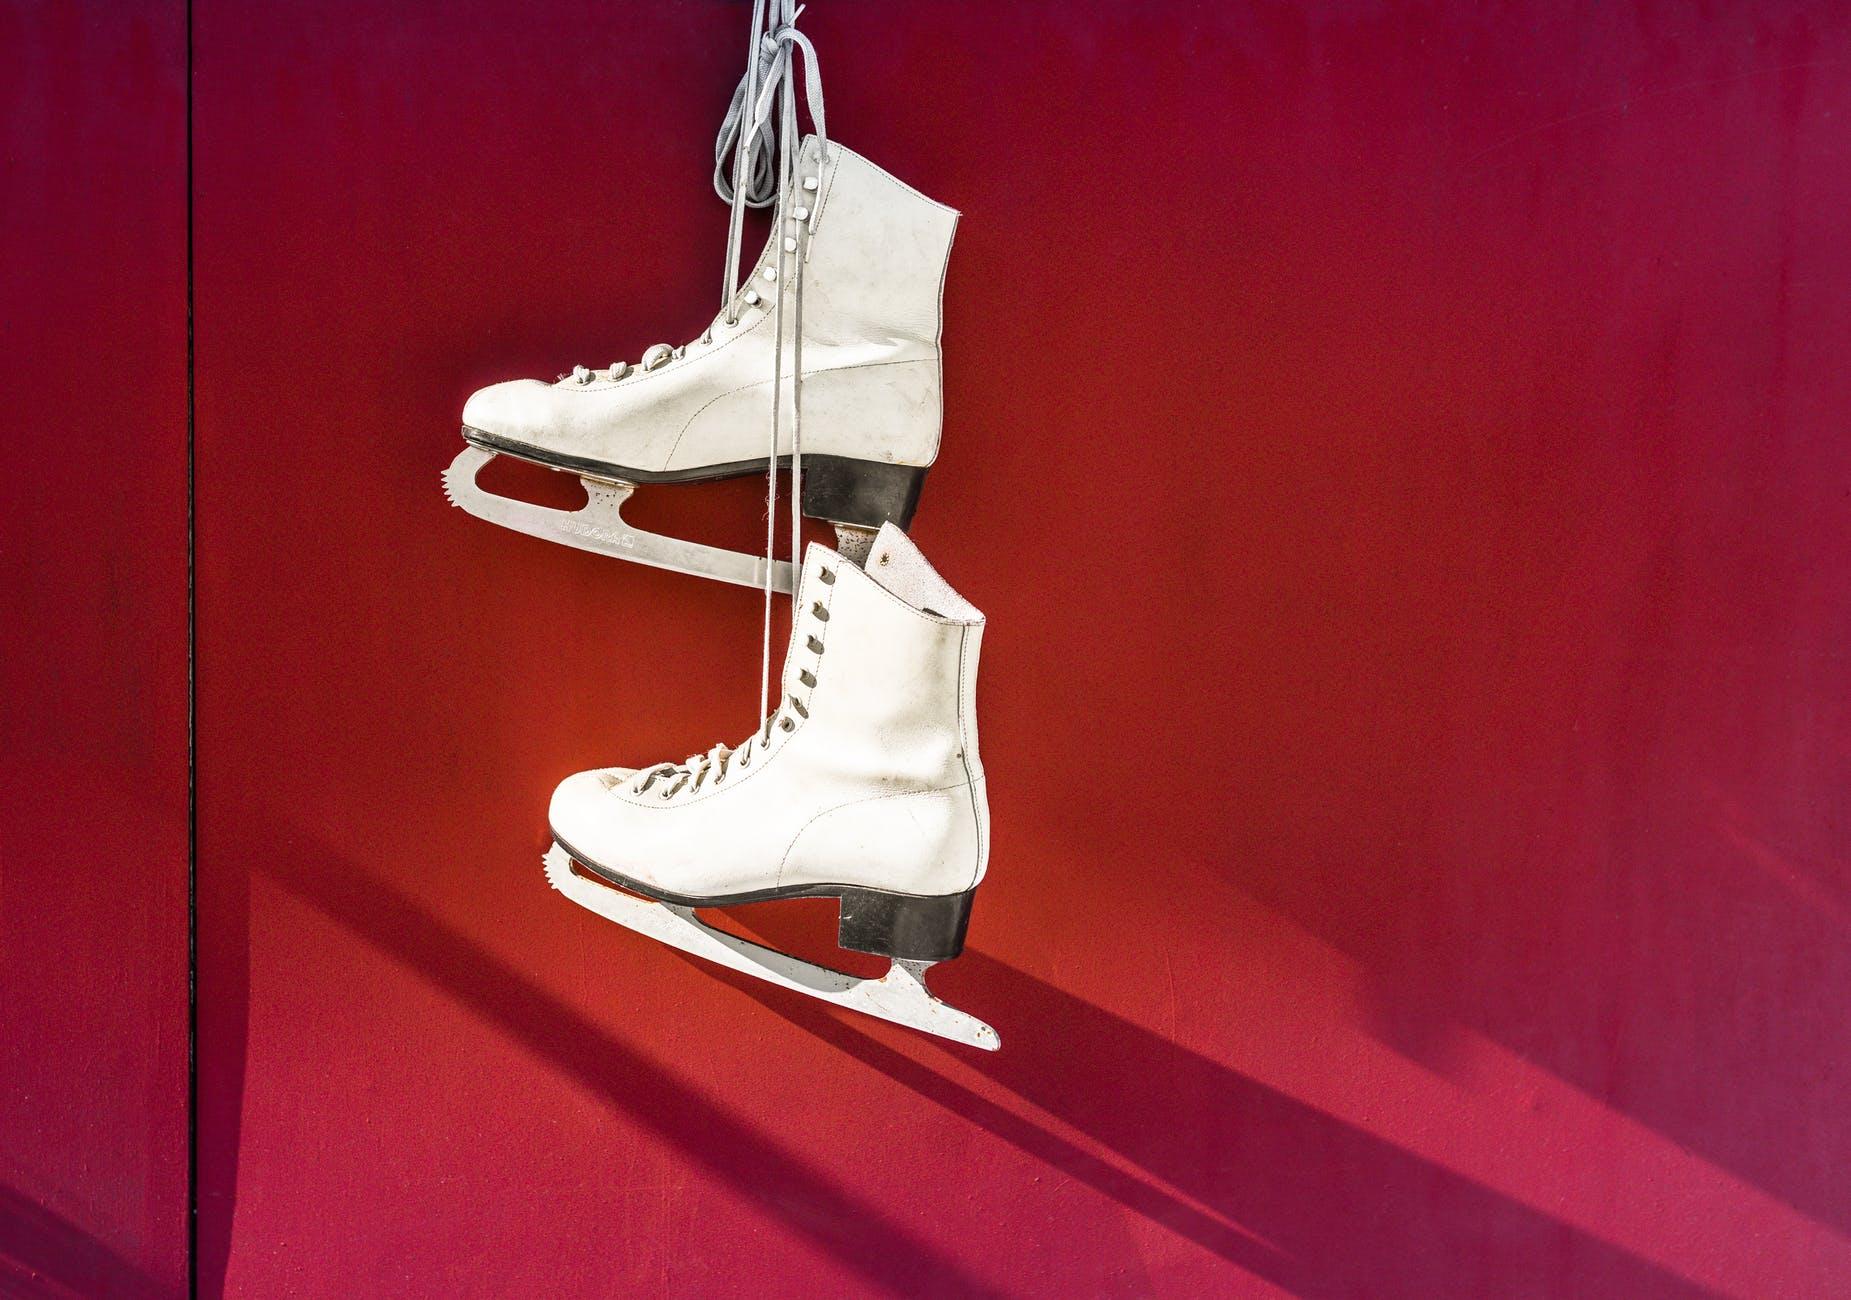 Surya Bonaly pattinaggio sul ghiaccio